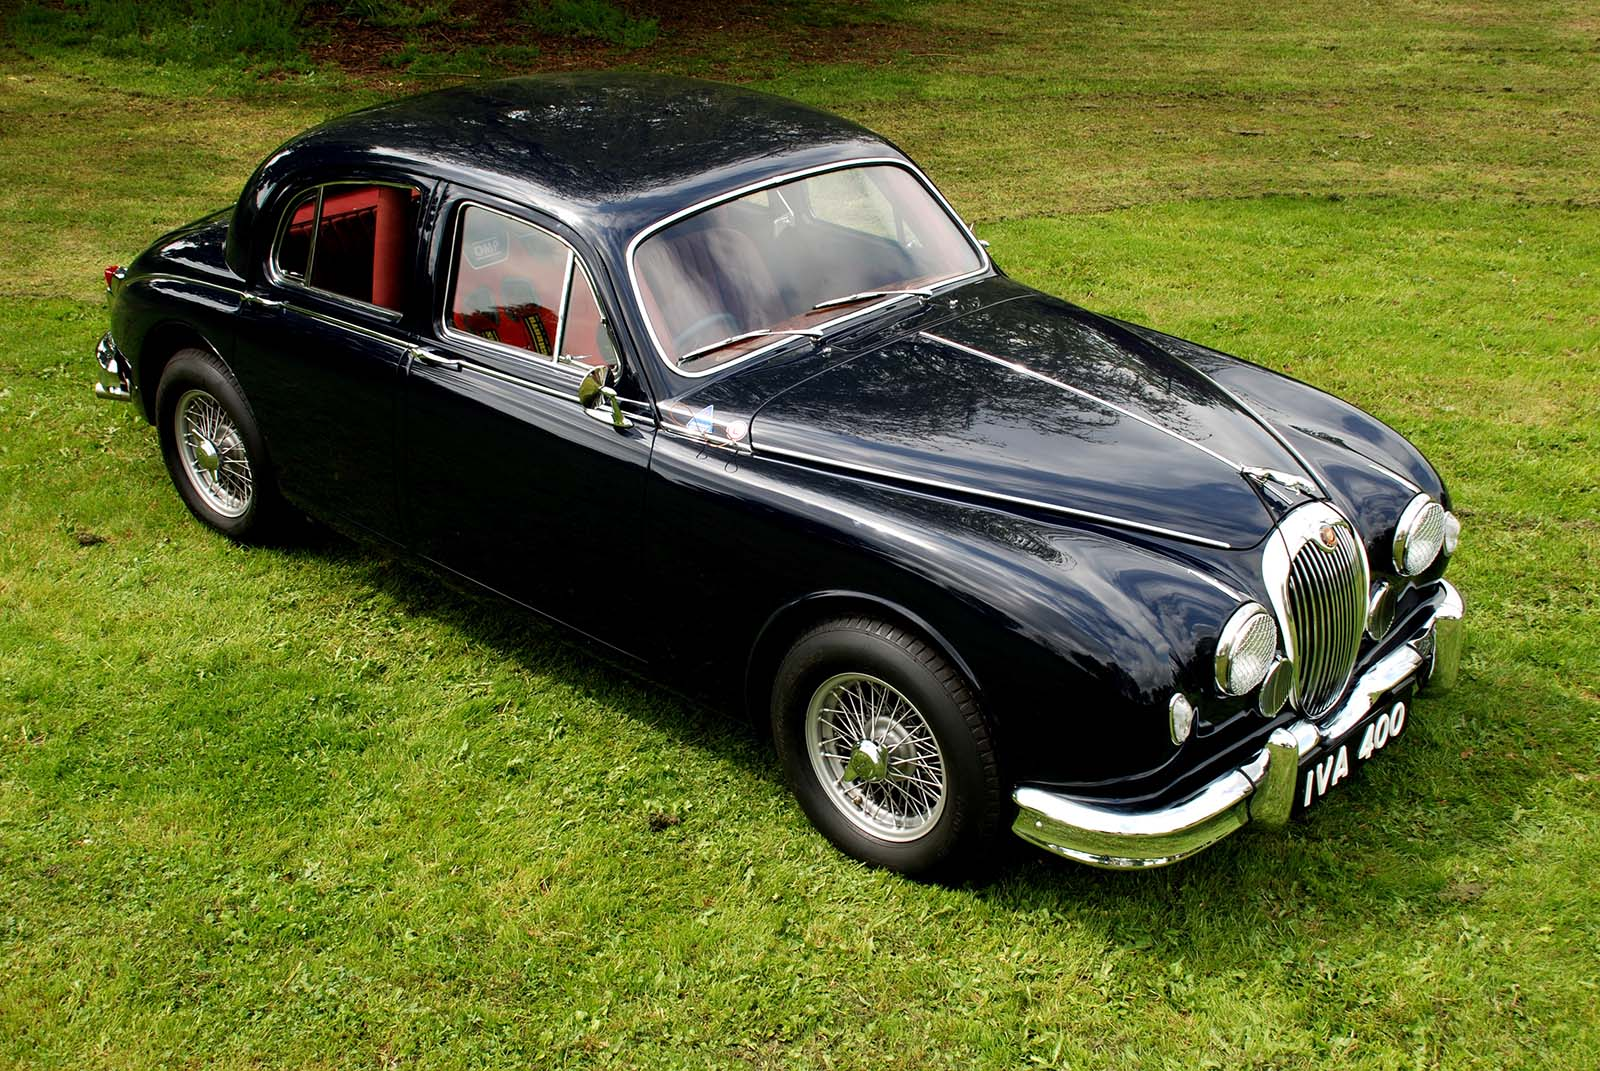 1959 bscc_Jaguar_competition_mk I_sayer selection_scragg_wilkinson_iva400_web_13.jpg